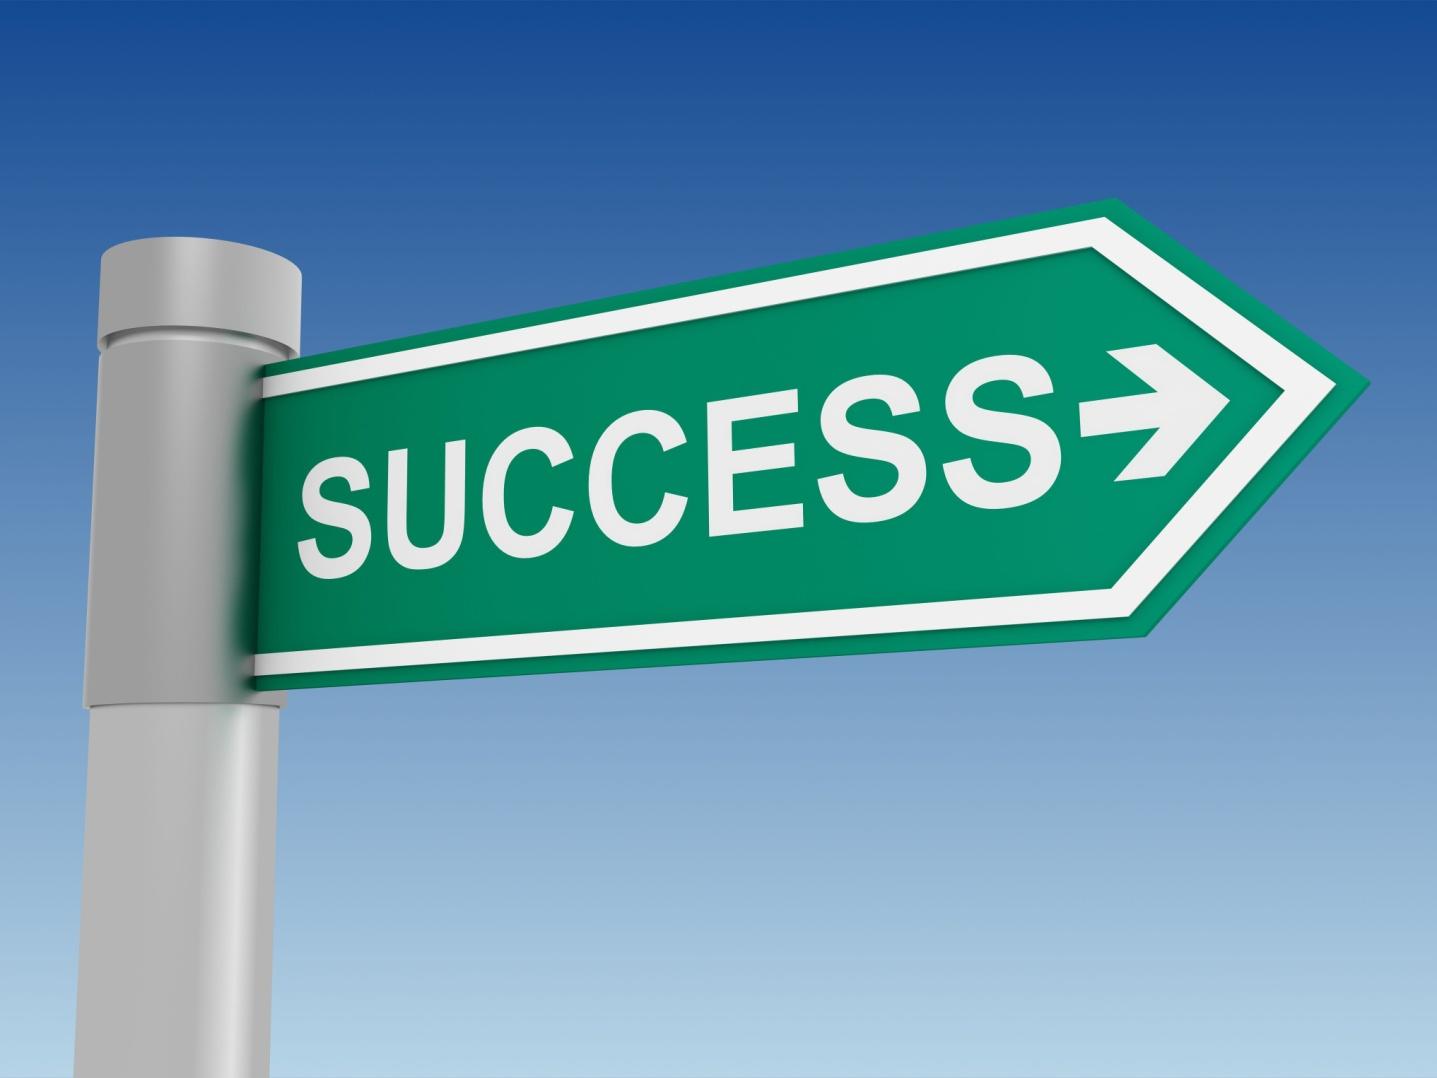 success-sign-185311872-5717ec0a3df78c3fa26ac66f.jpg